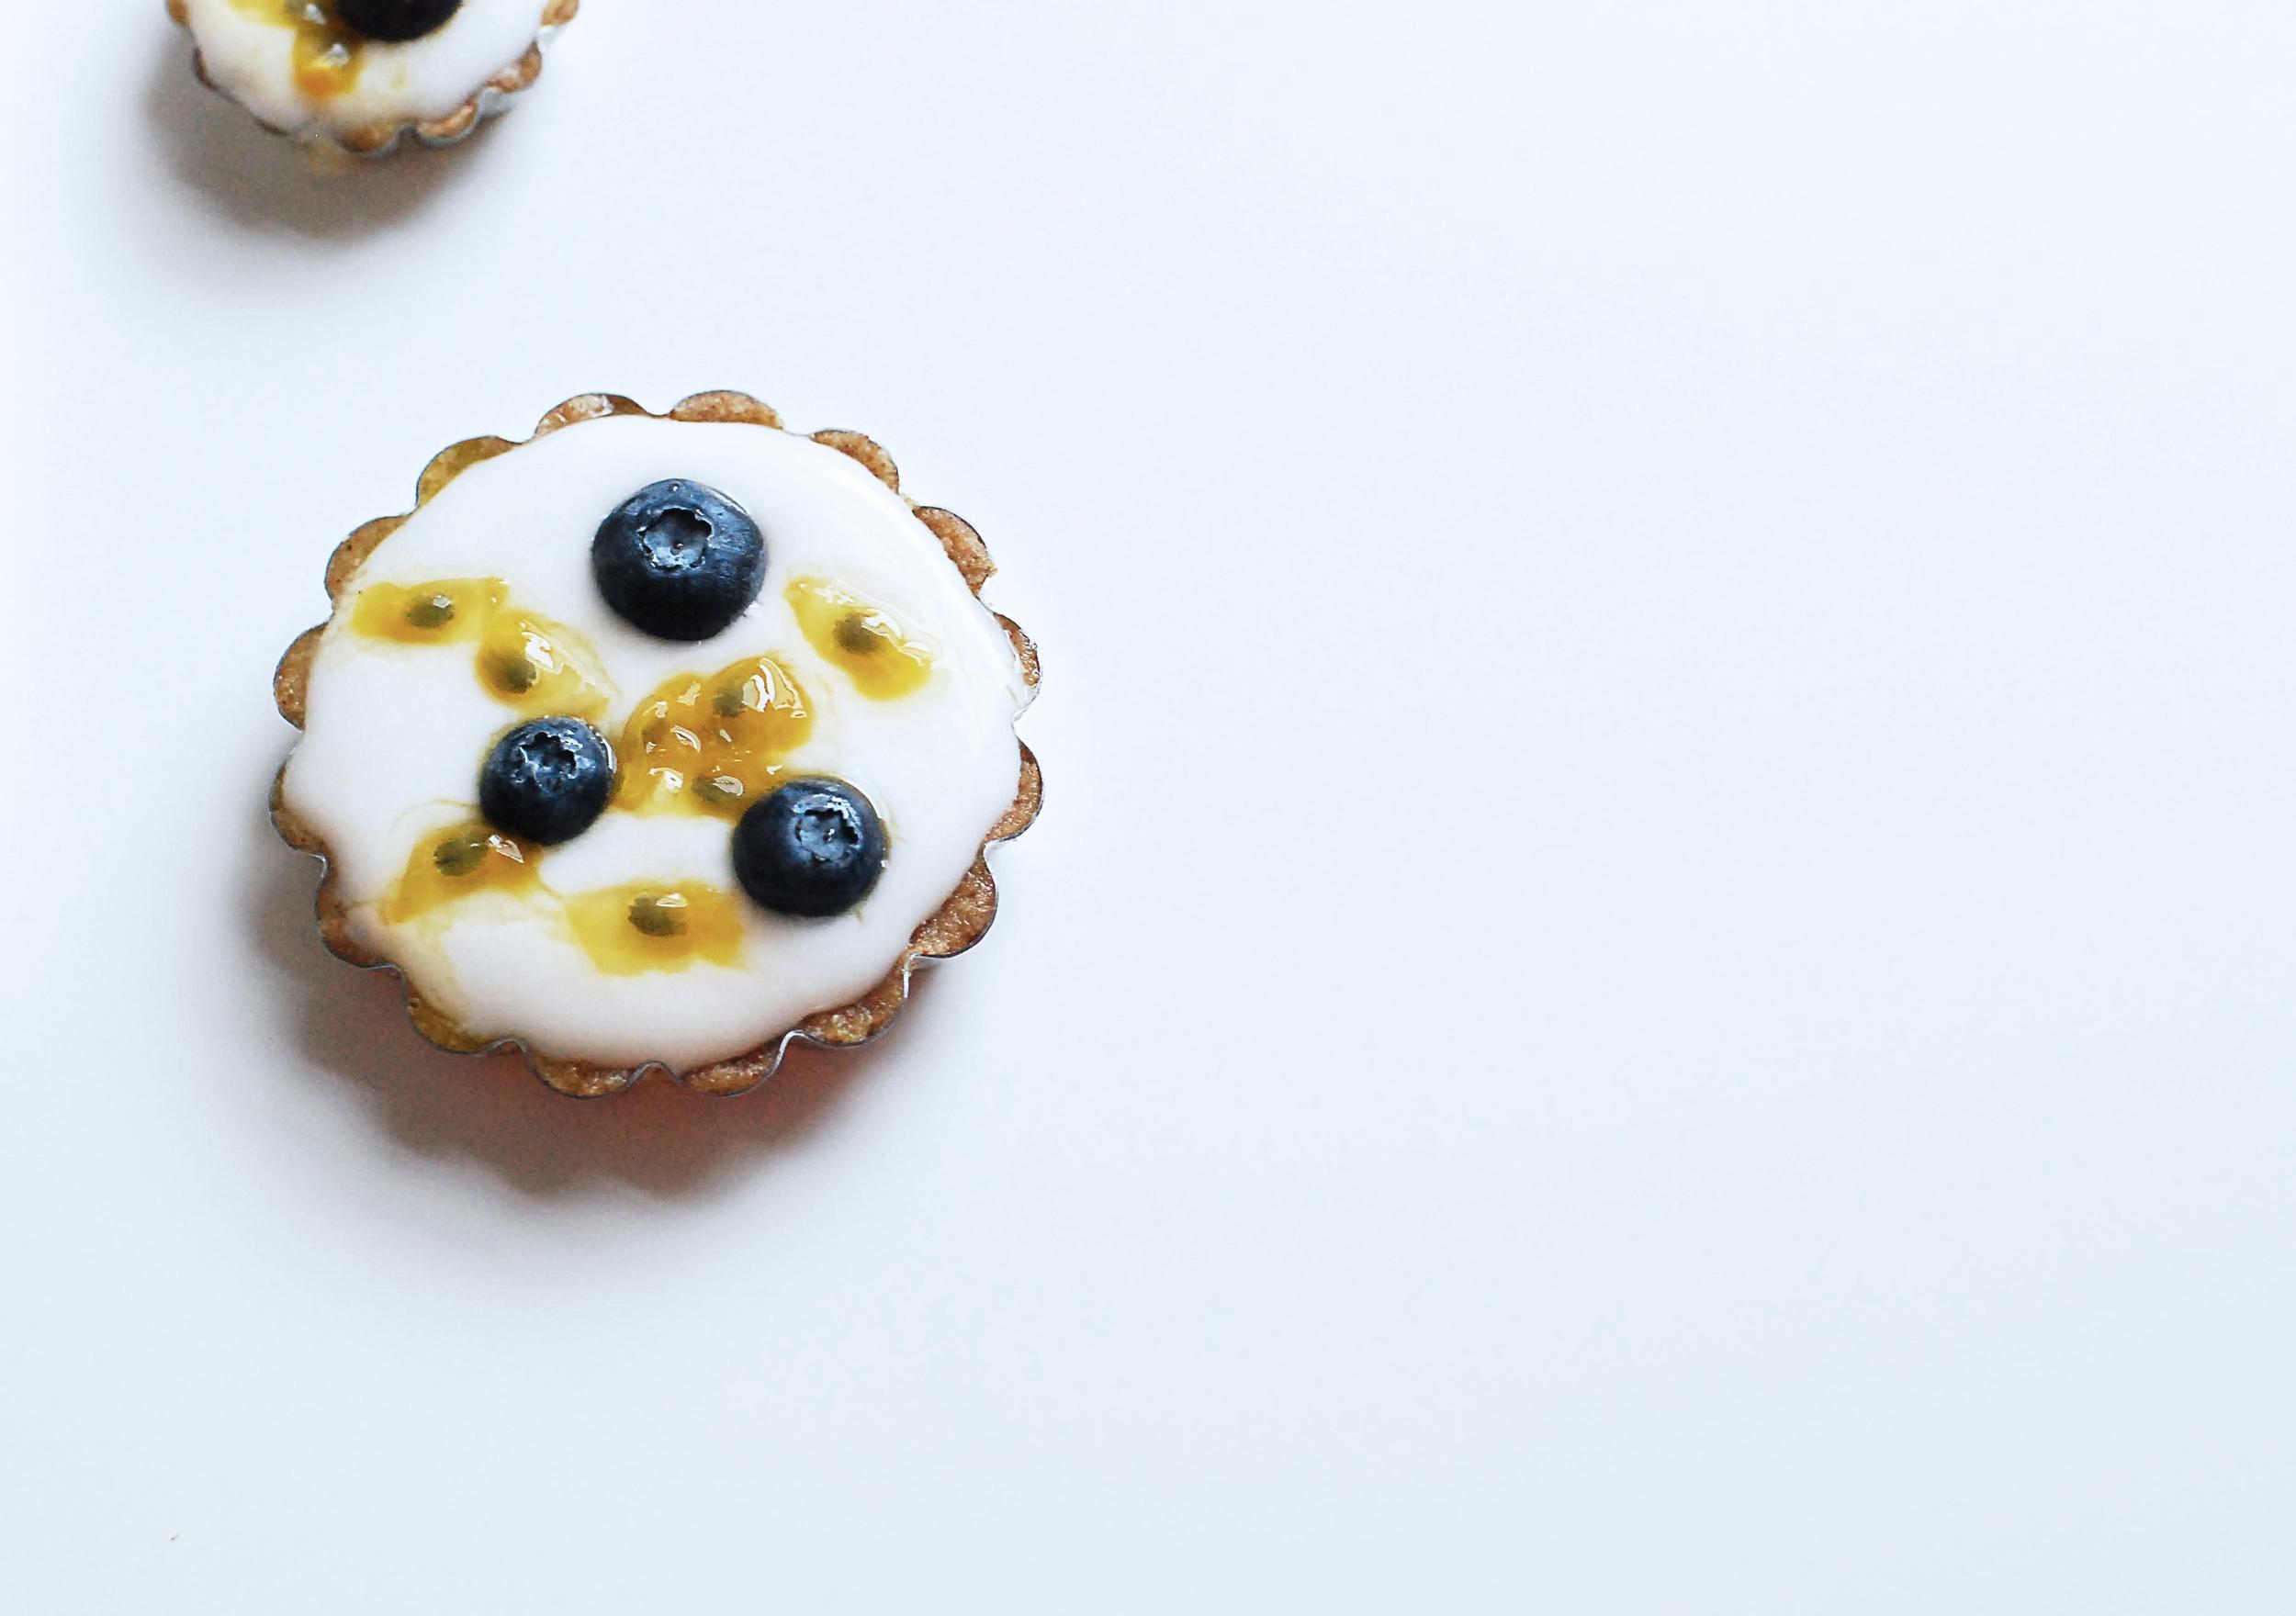 Vegan Gluten Free Blueberry Tart